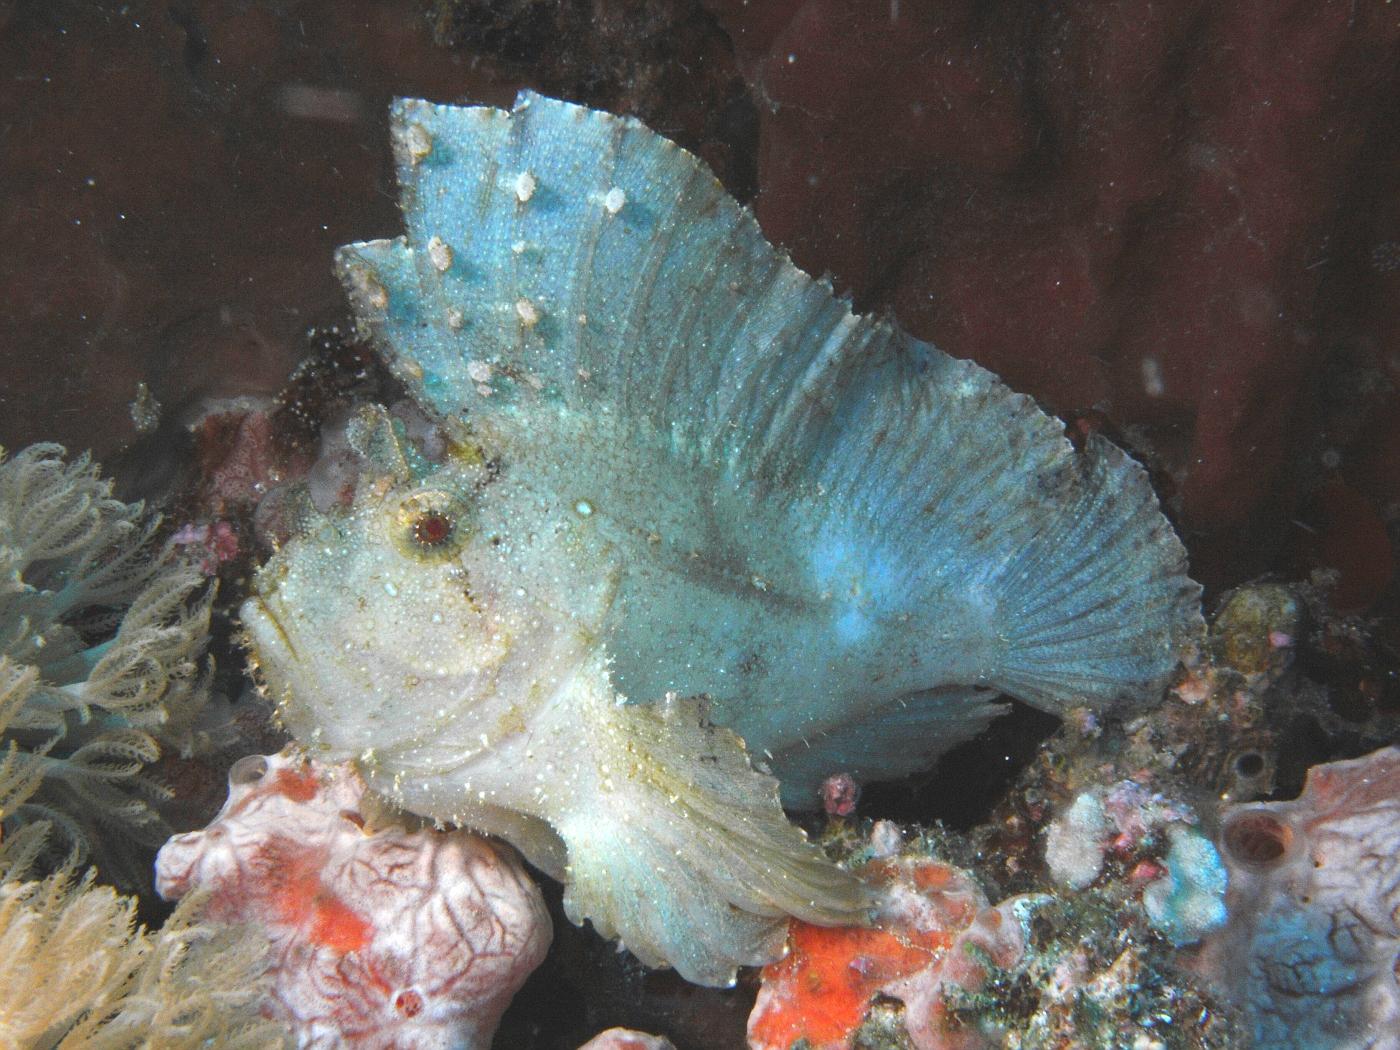 Leaf scorpionfish2